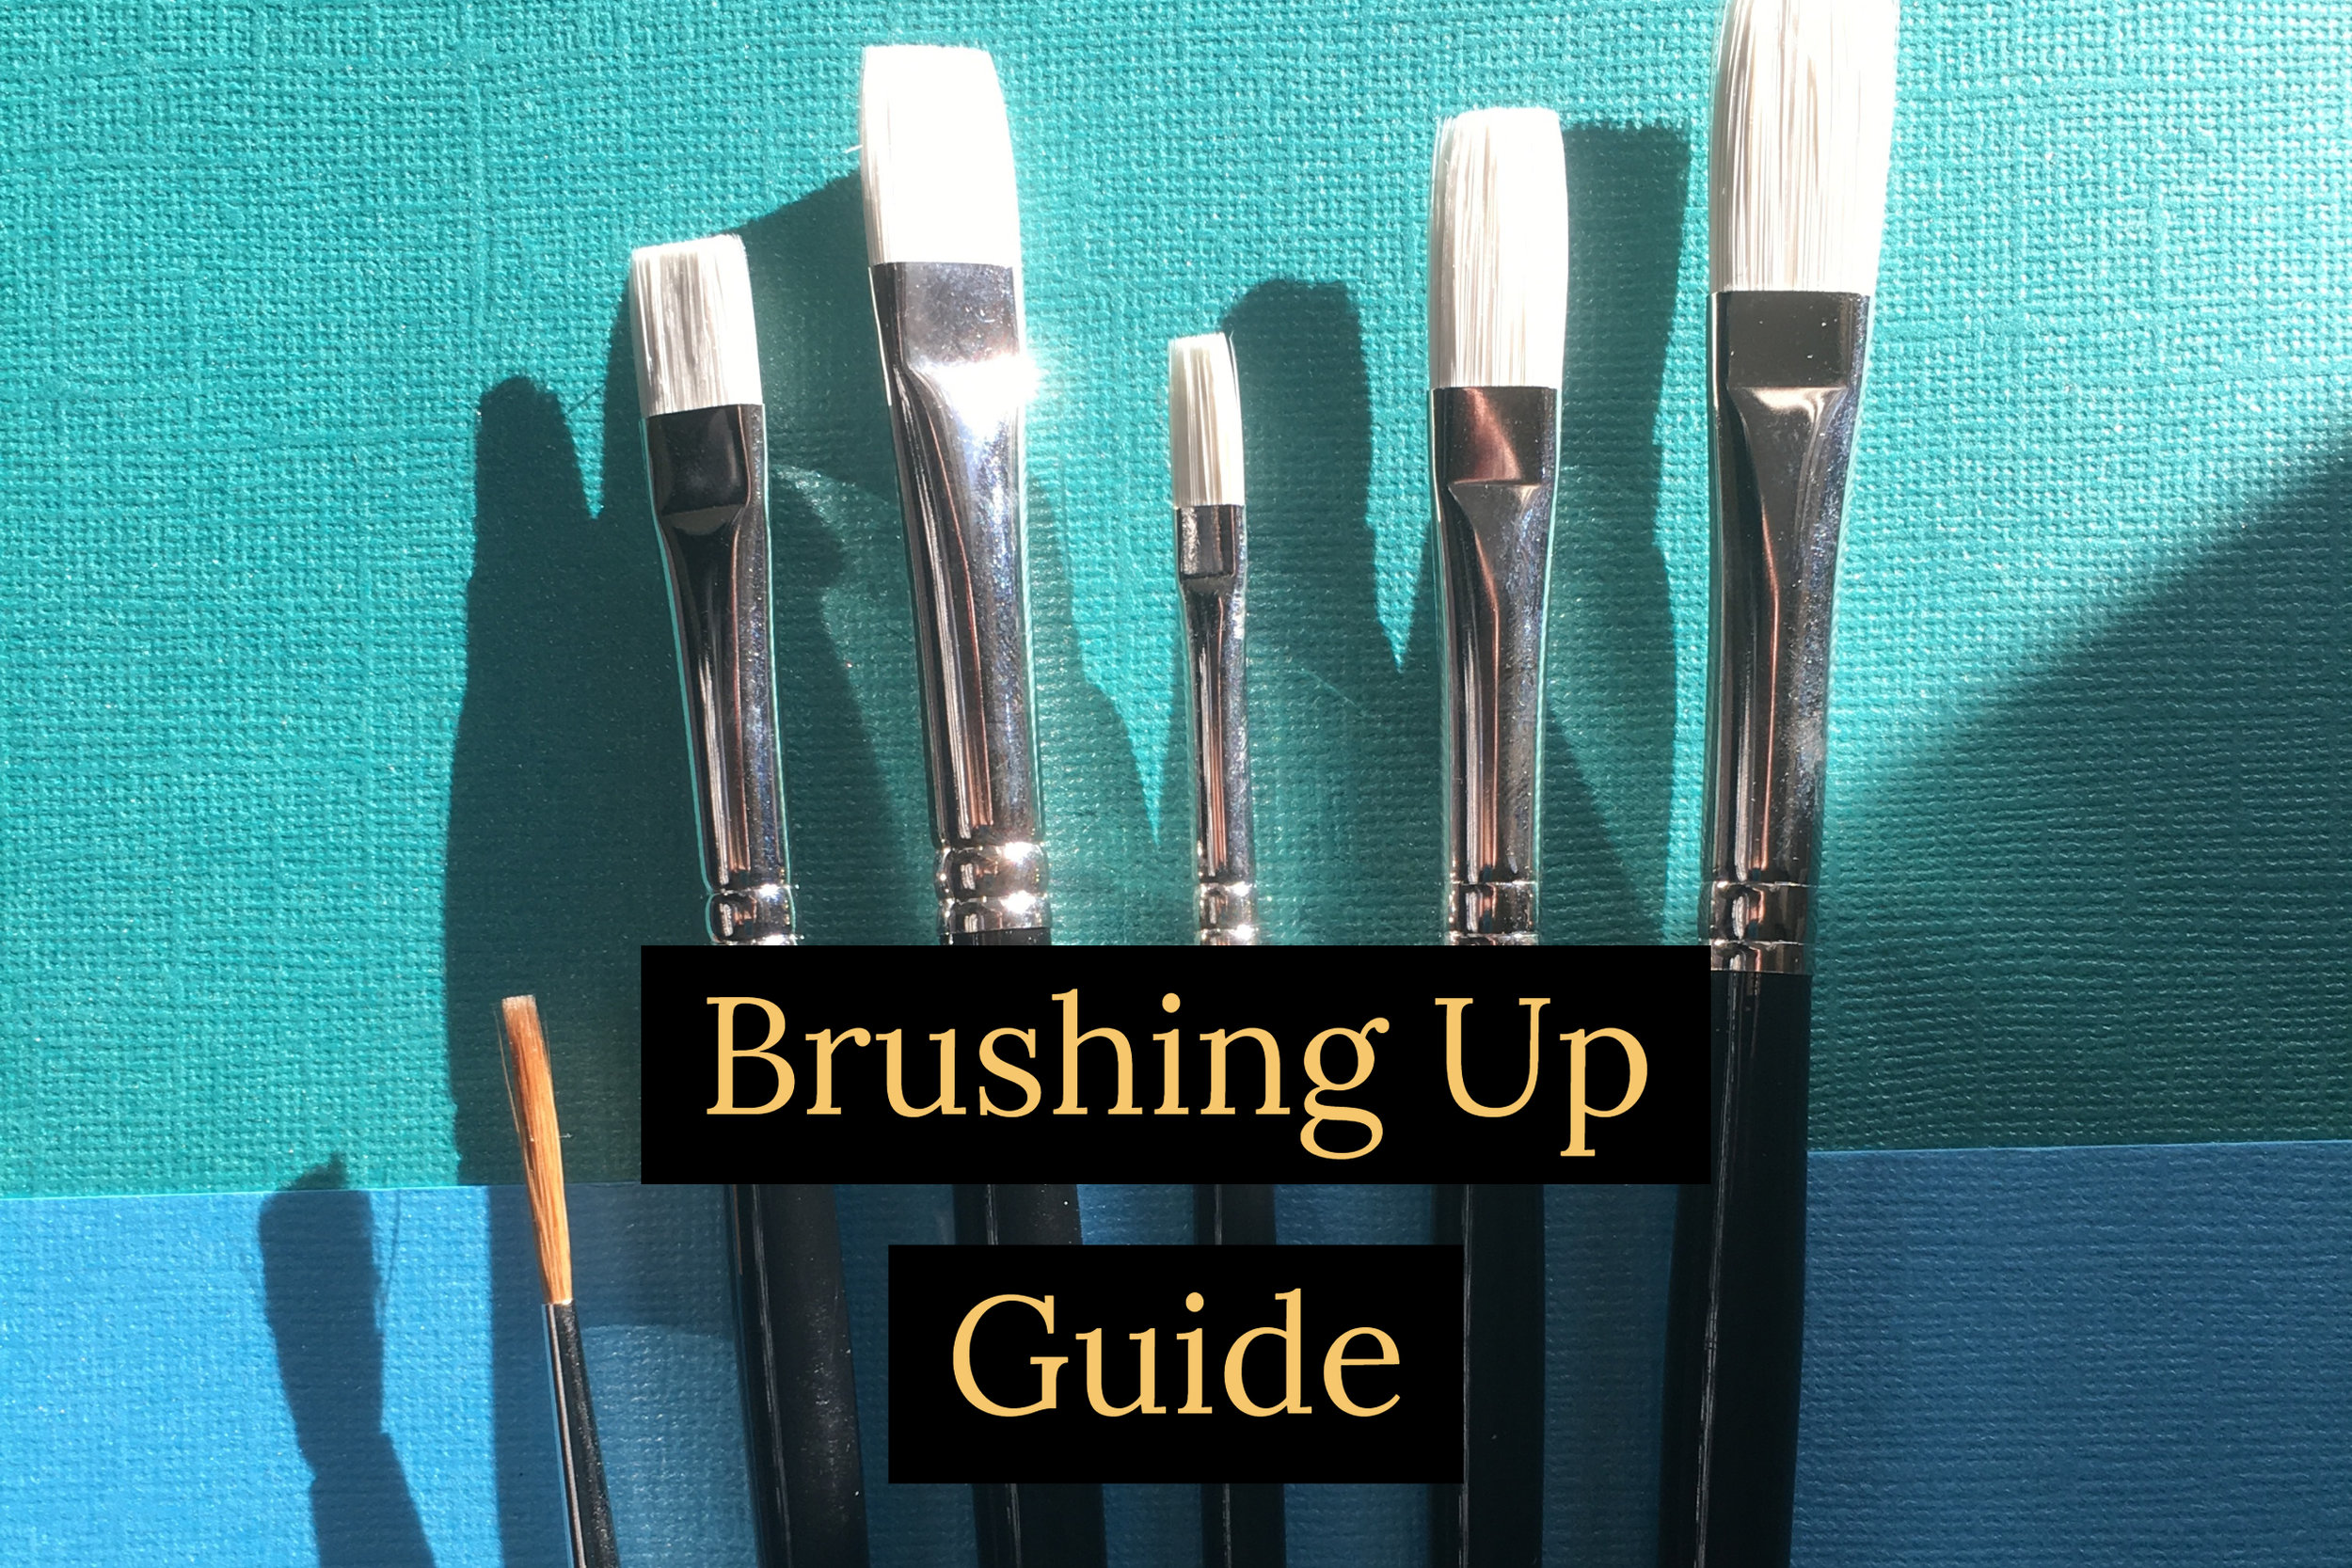 Brushing Up Guide.jpg